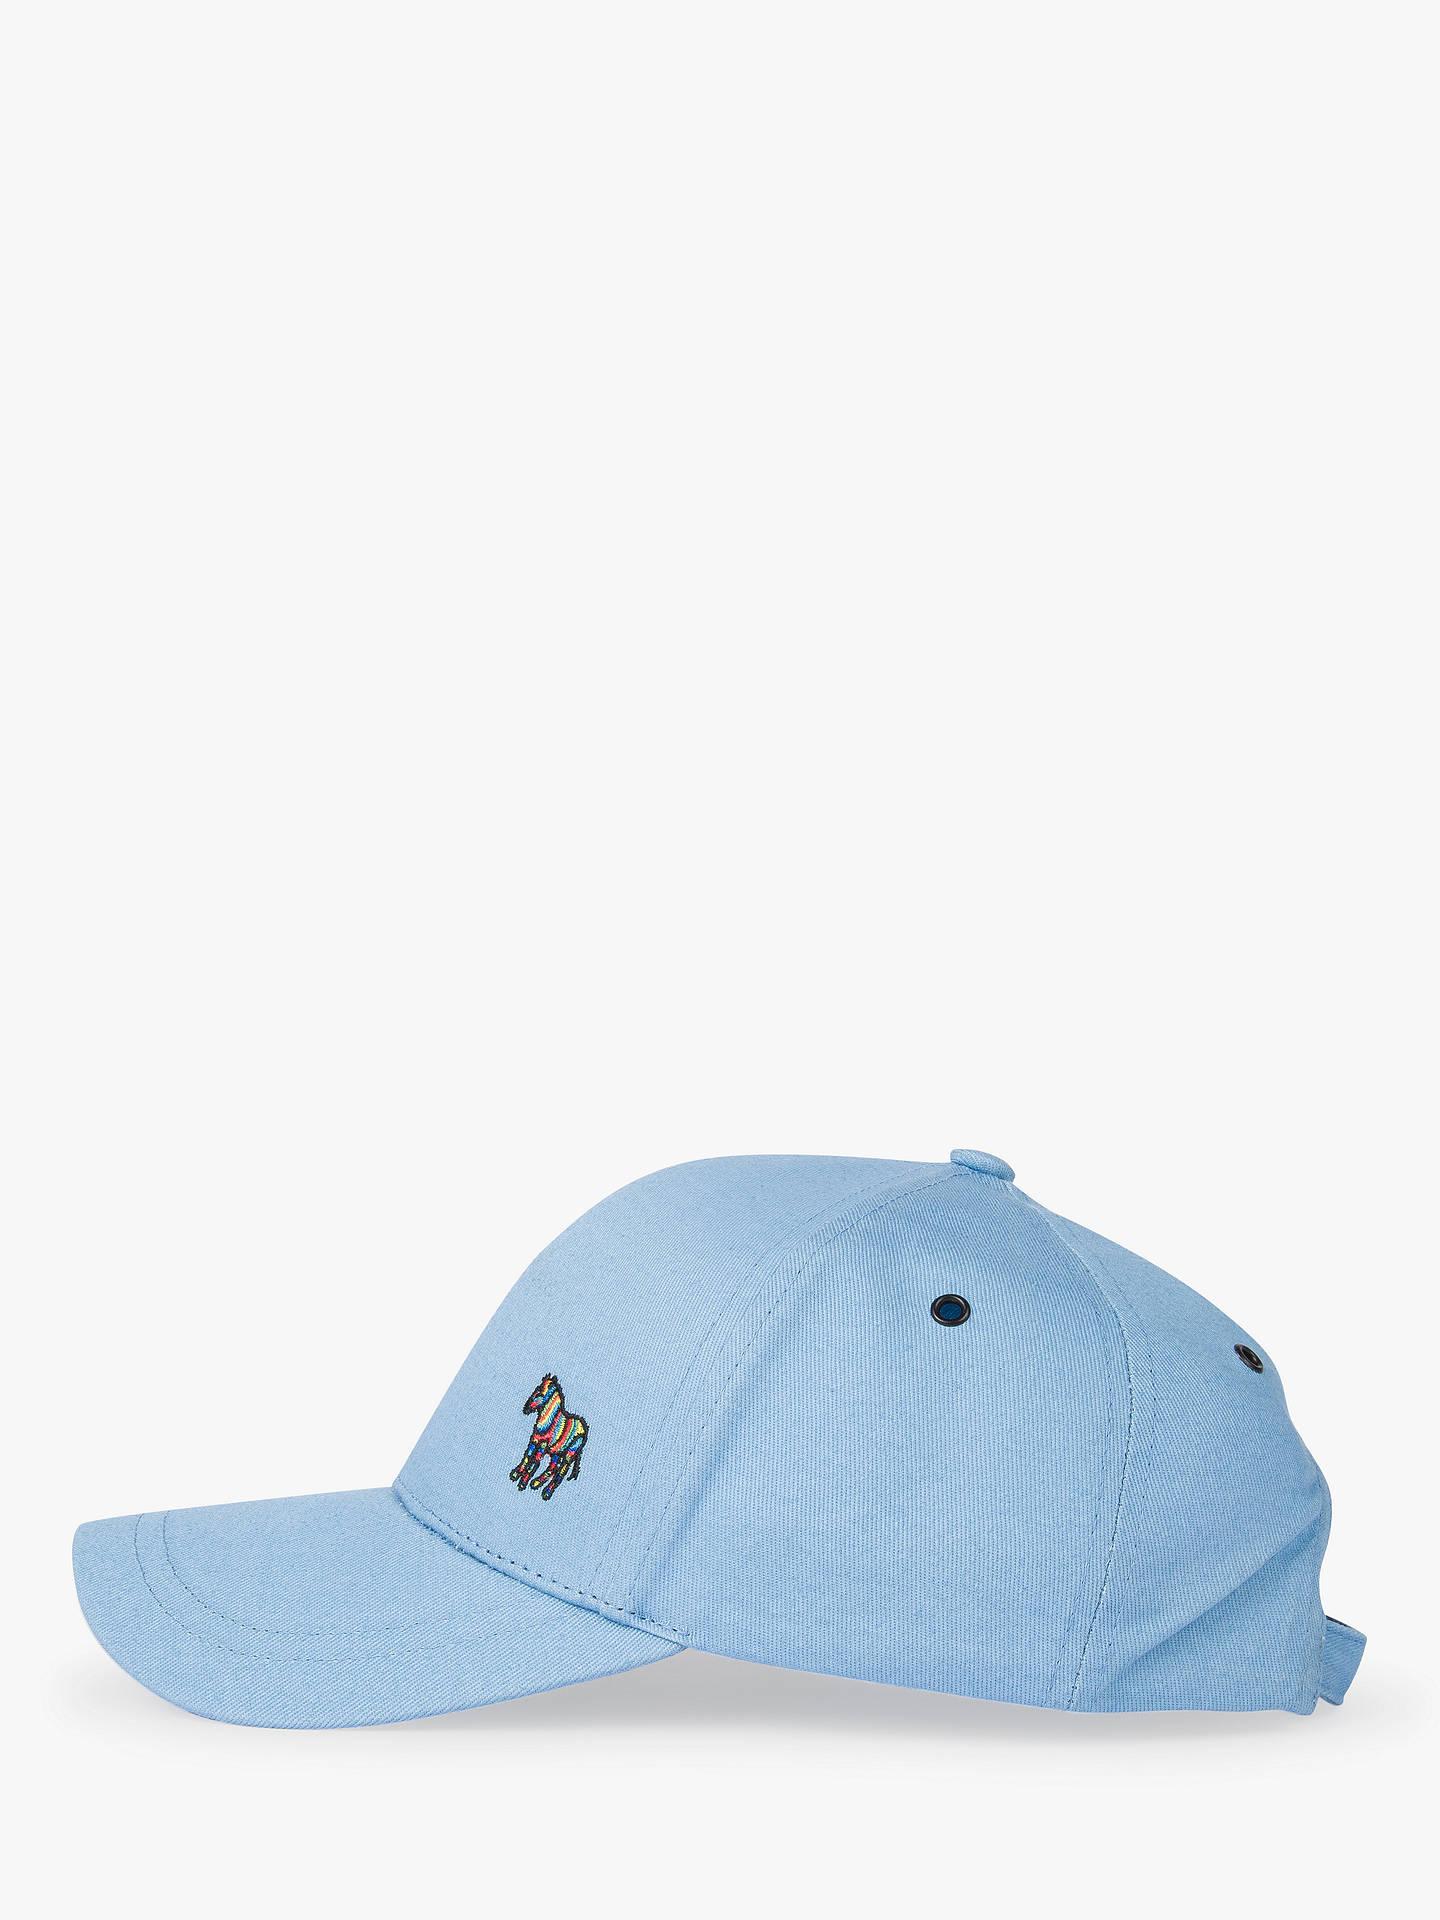 11ea6d6592f BuyPaul Smith Zebra Baseball Cap